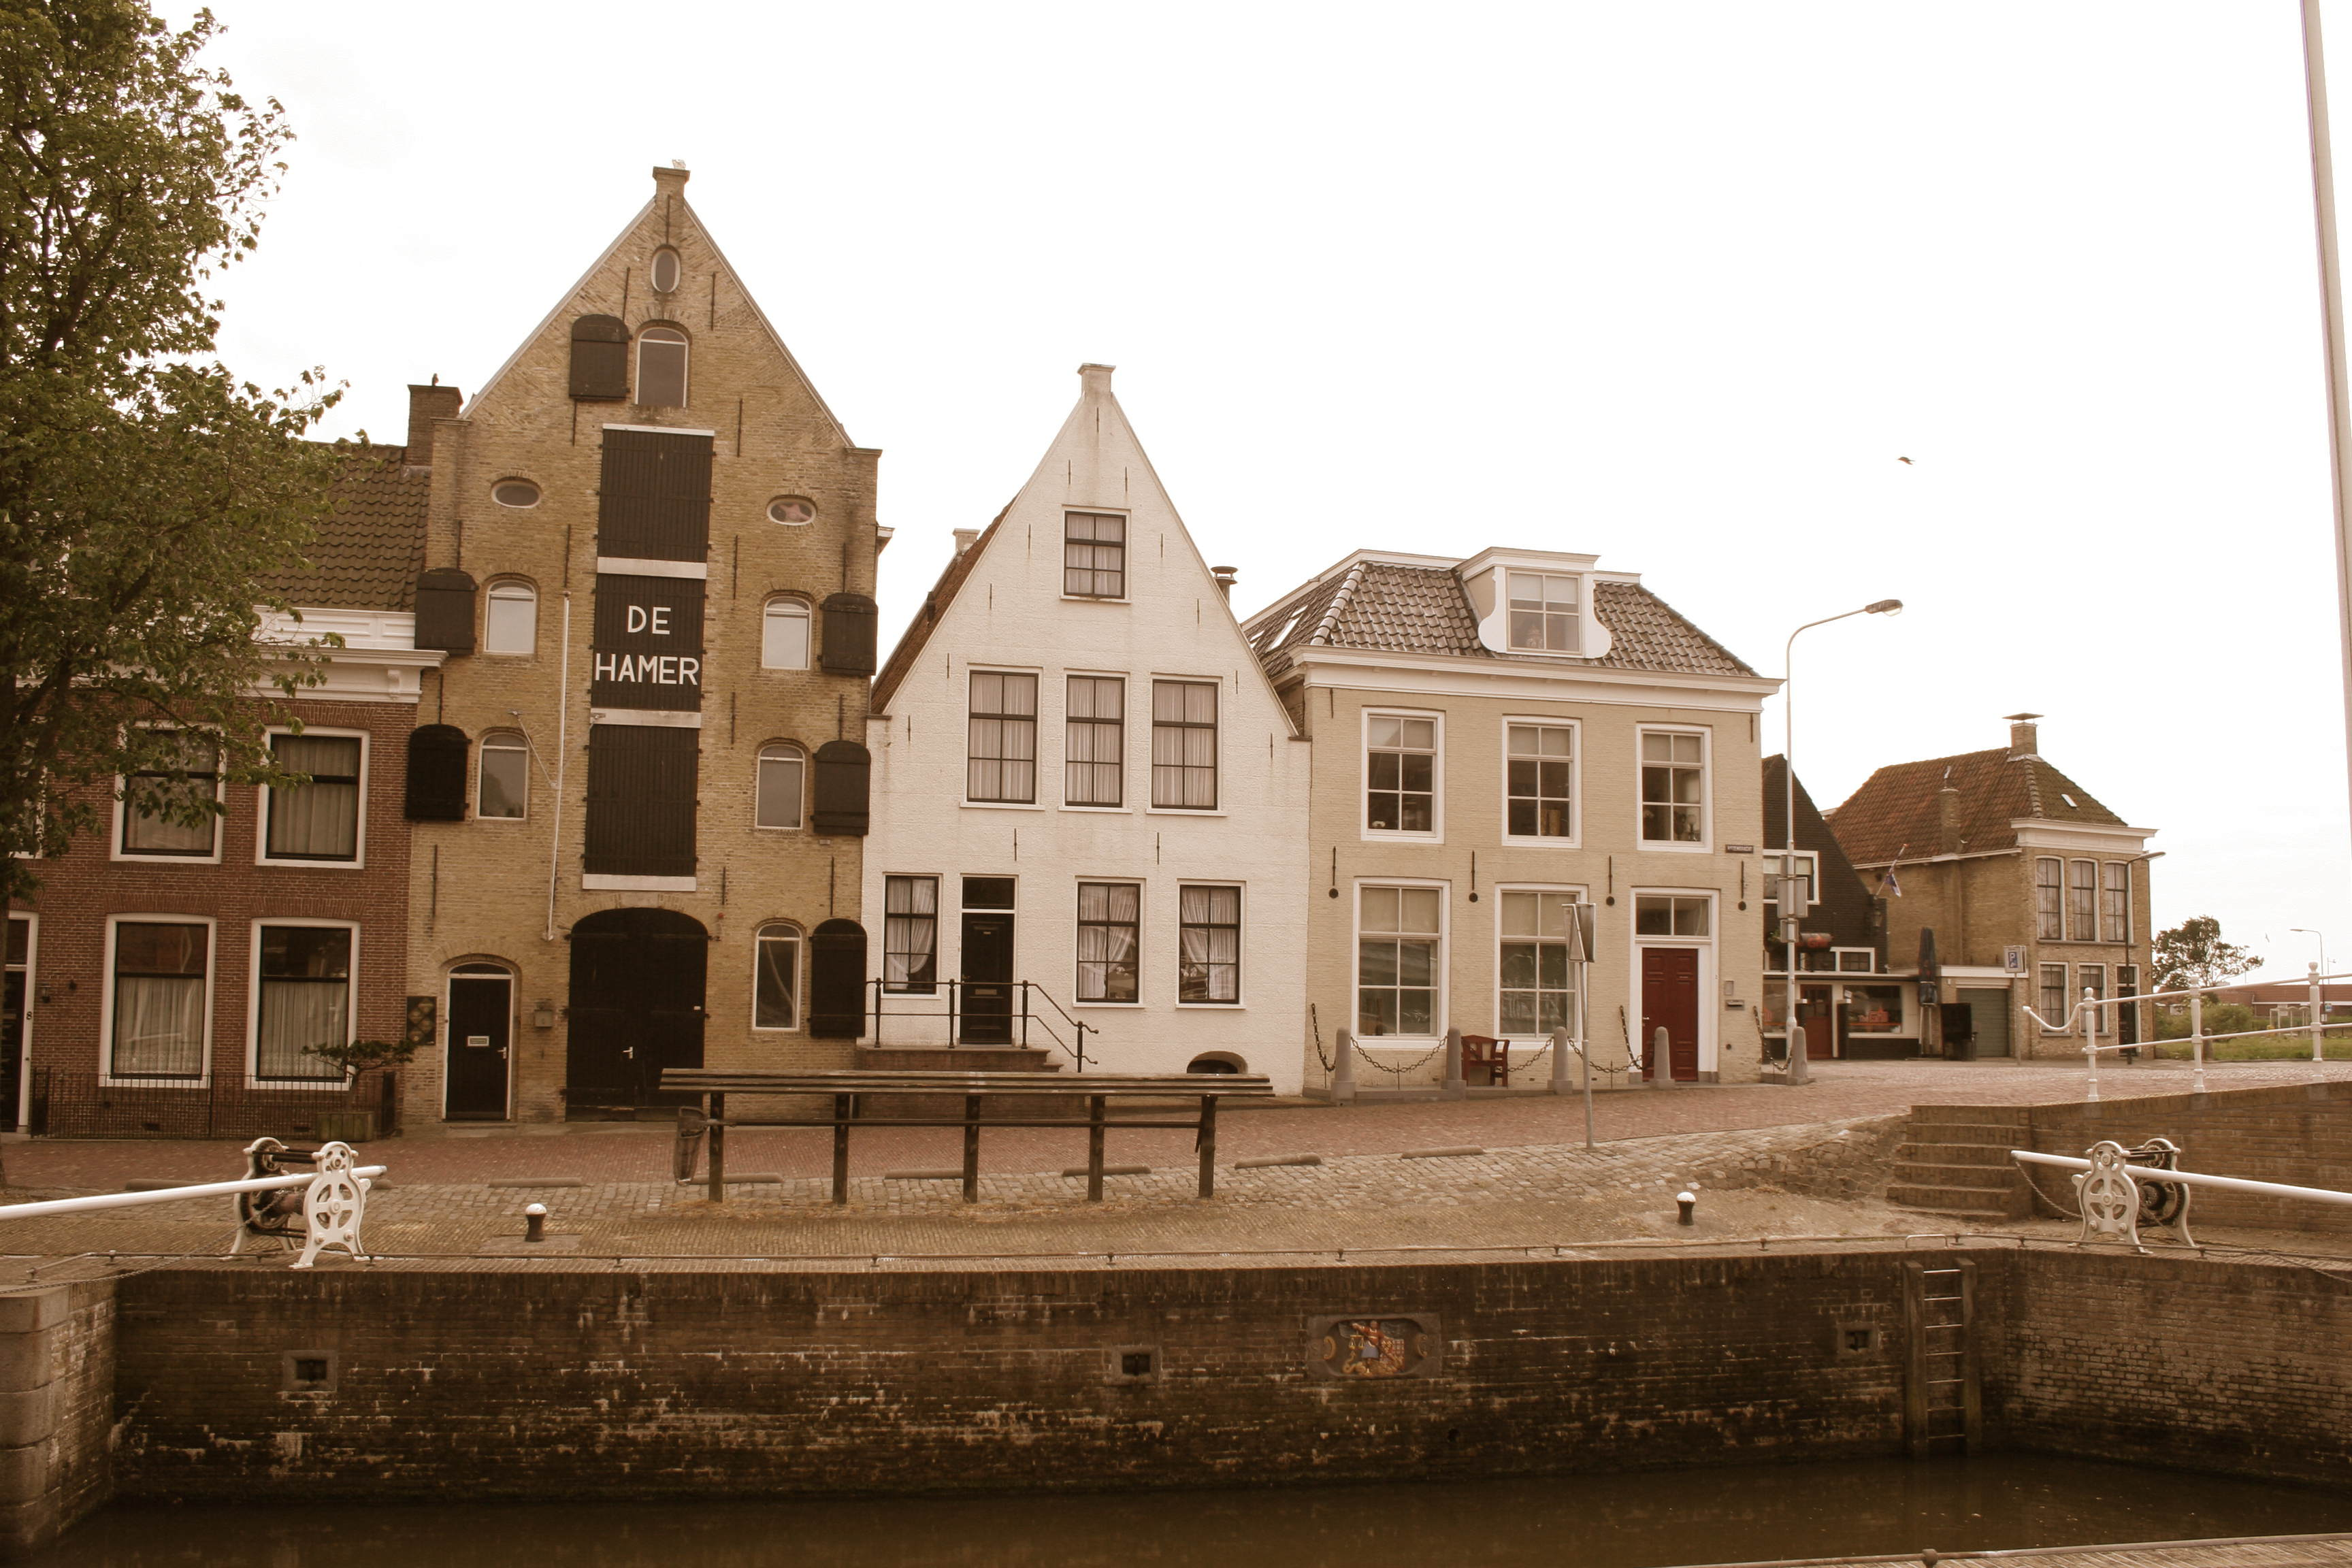 De Hamer Pakhuis